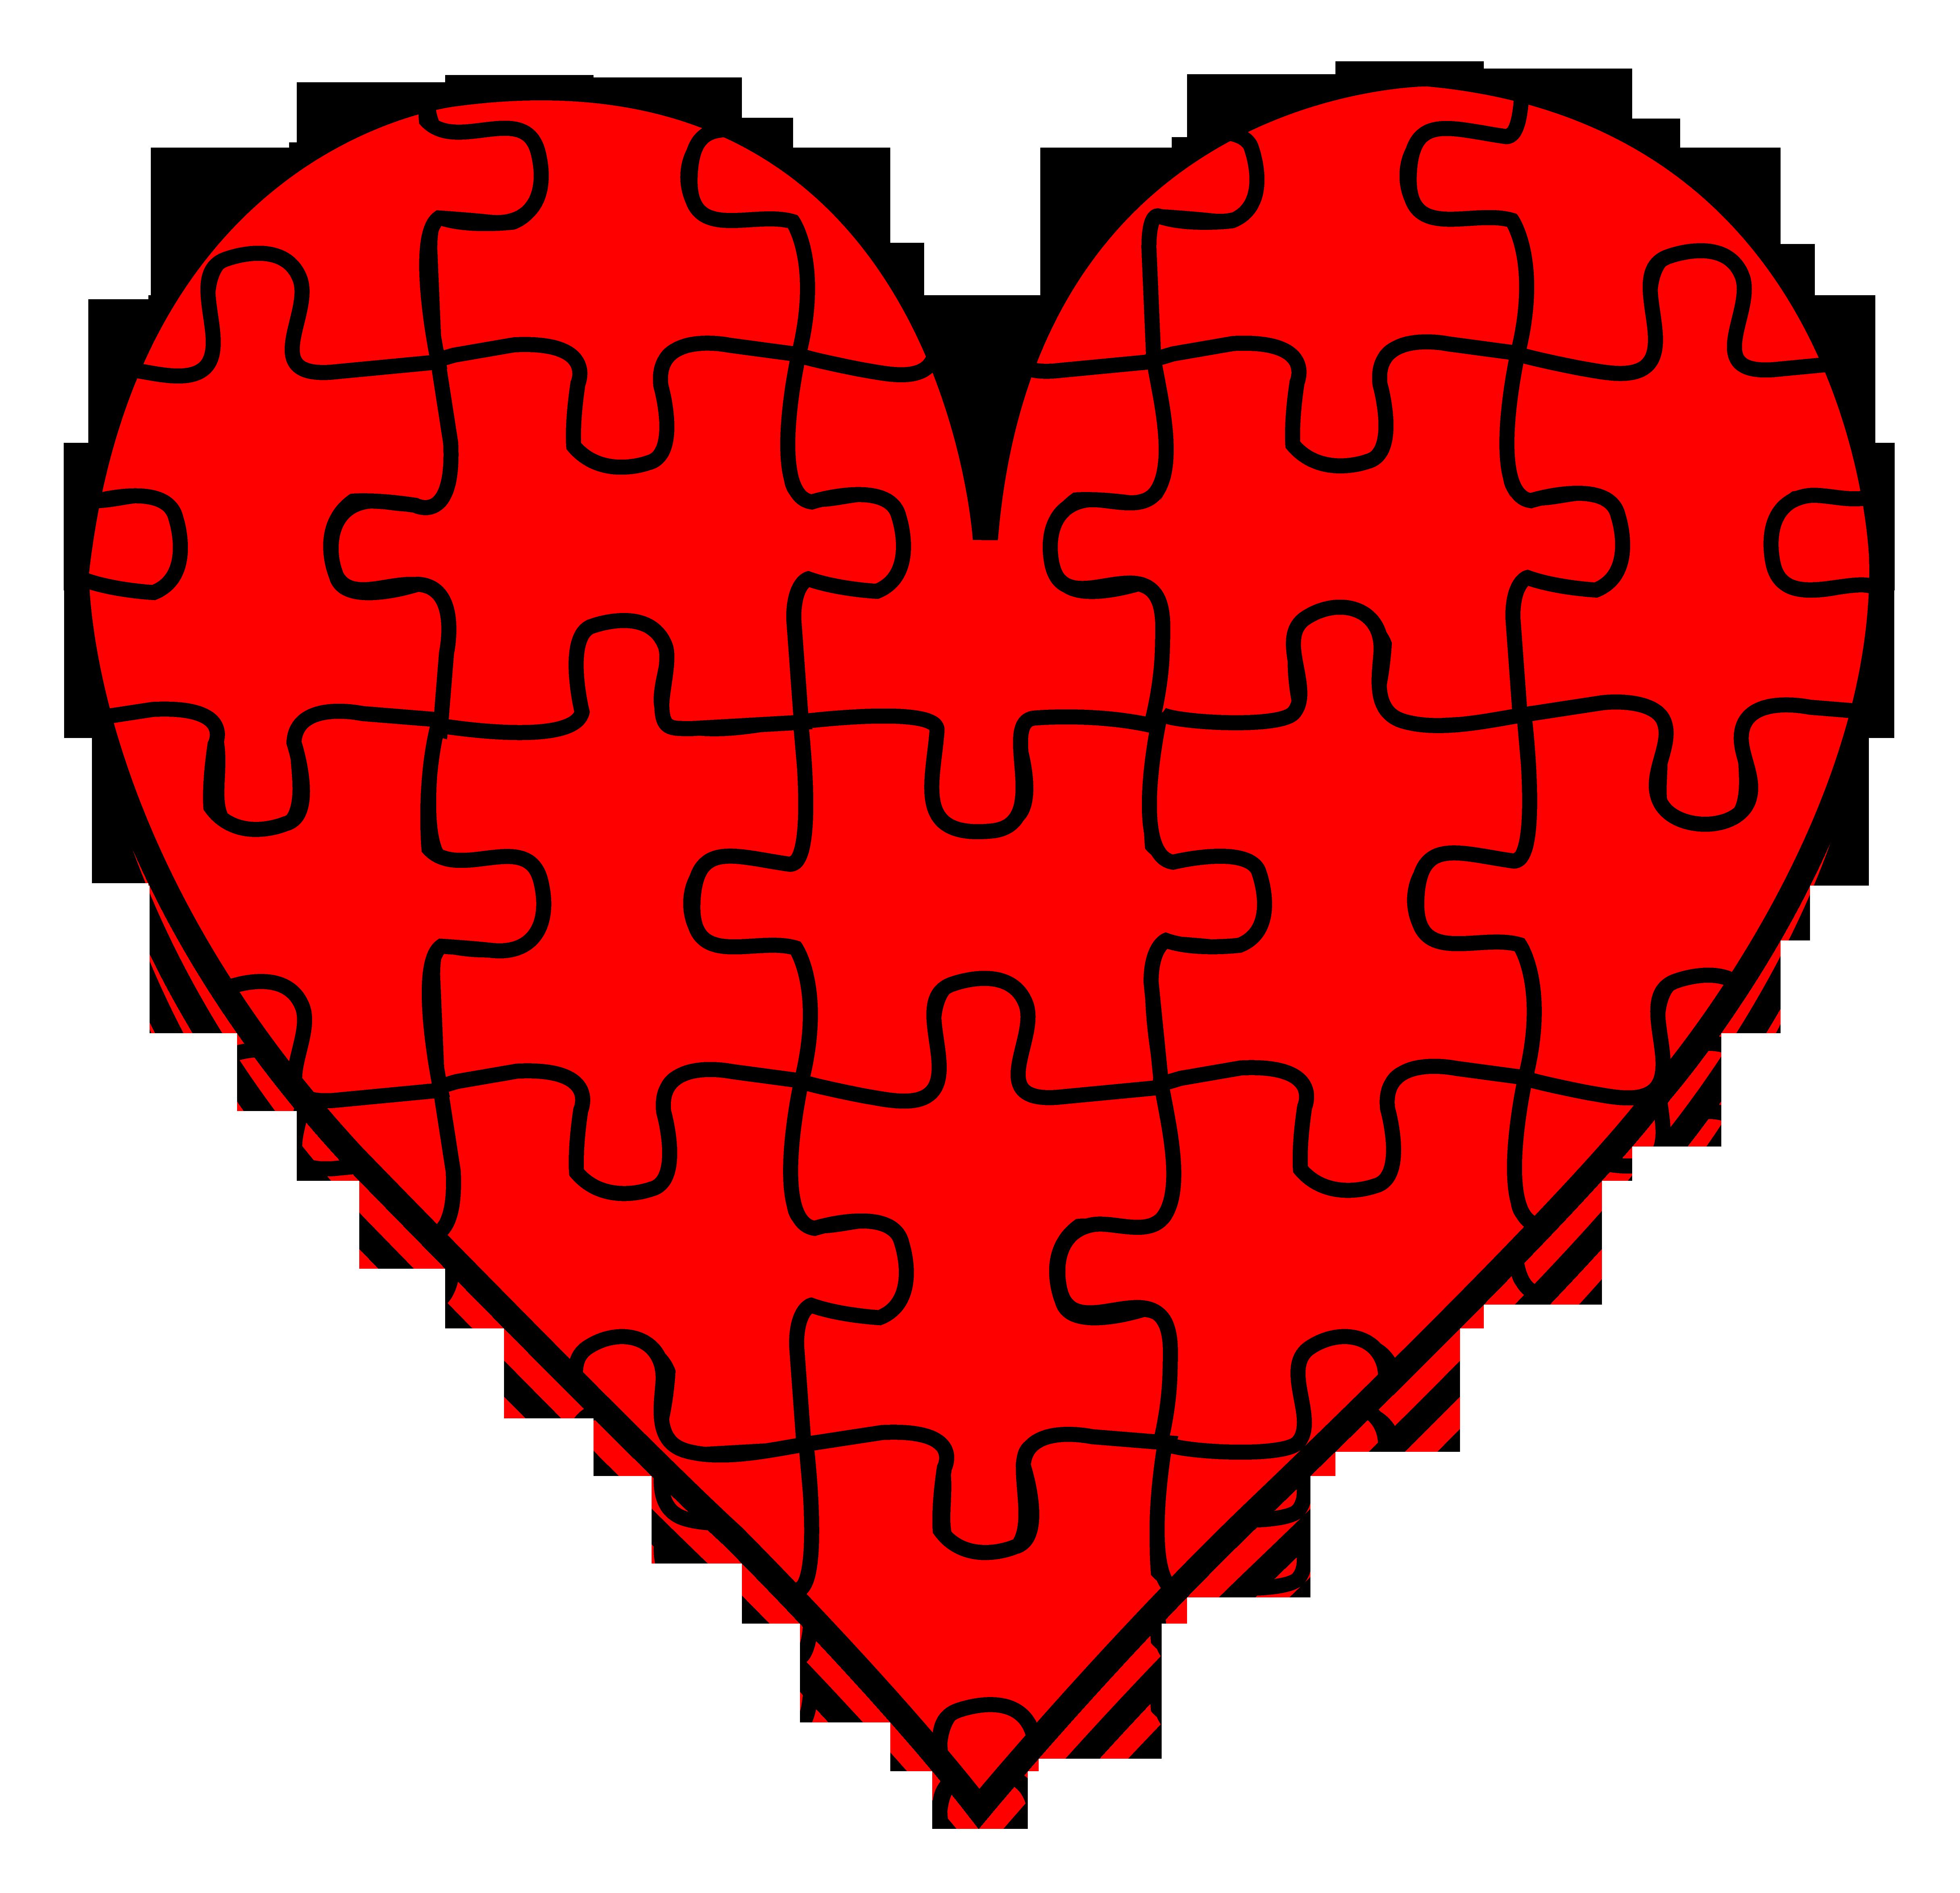 Heart puzzle clipart